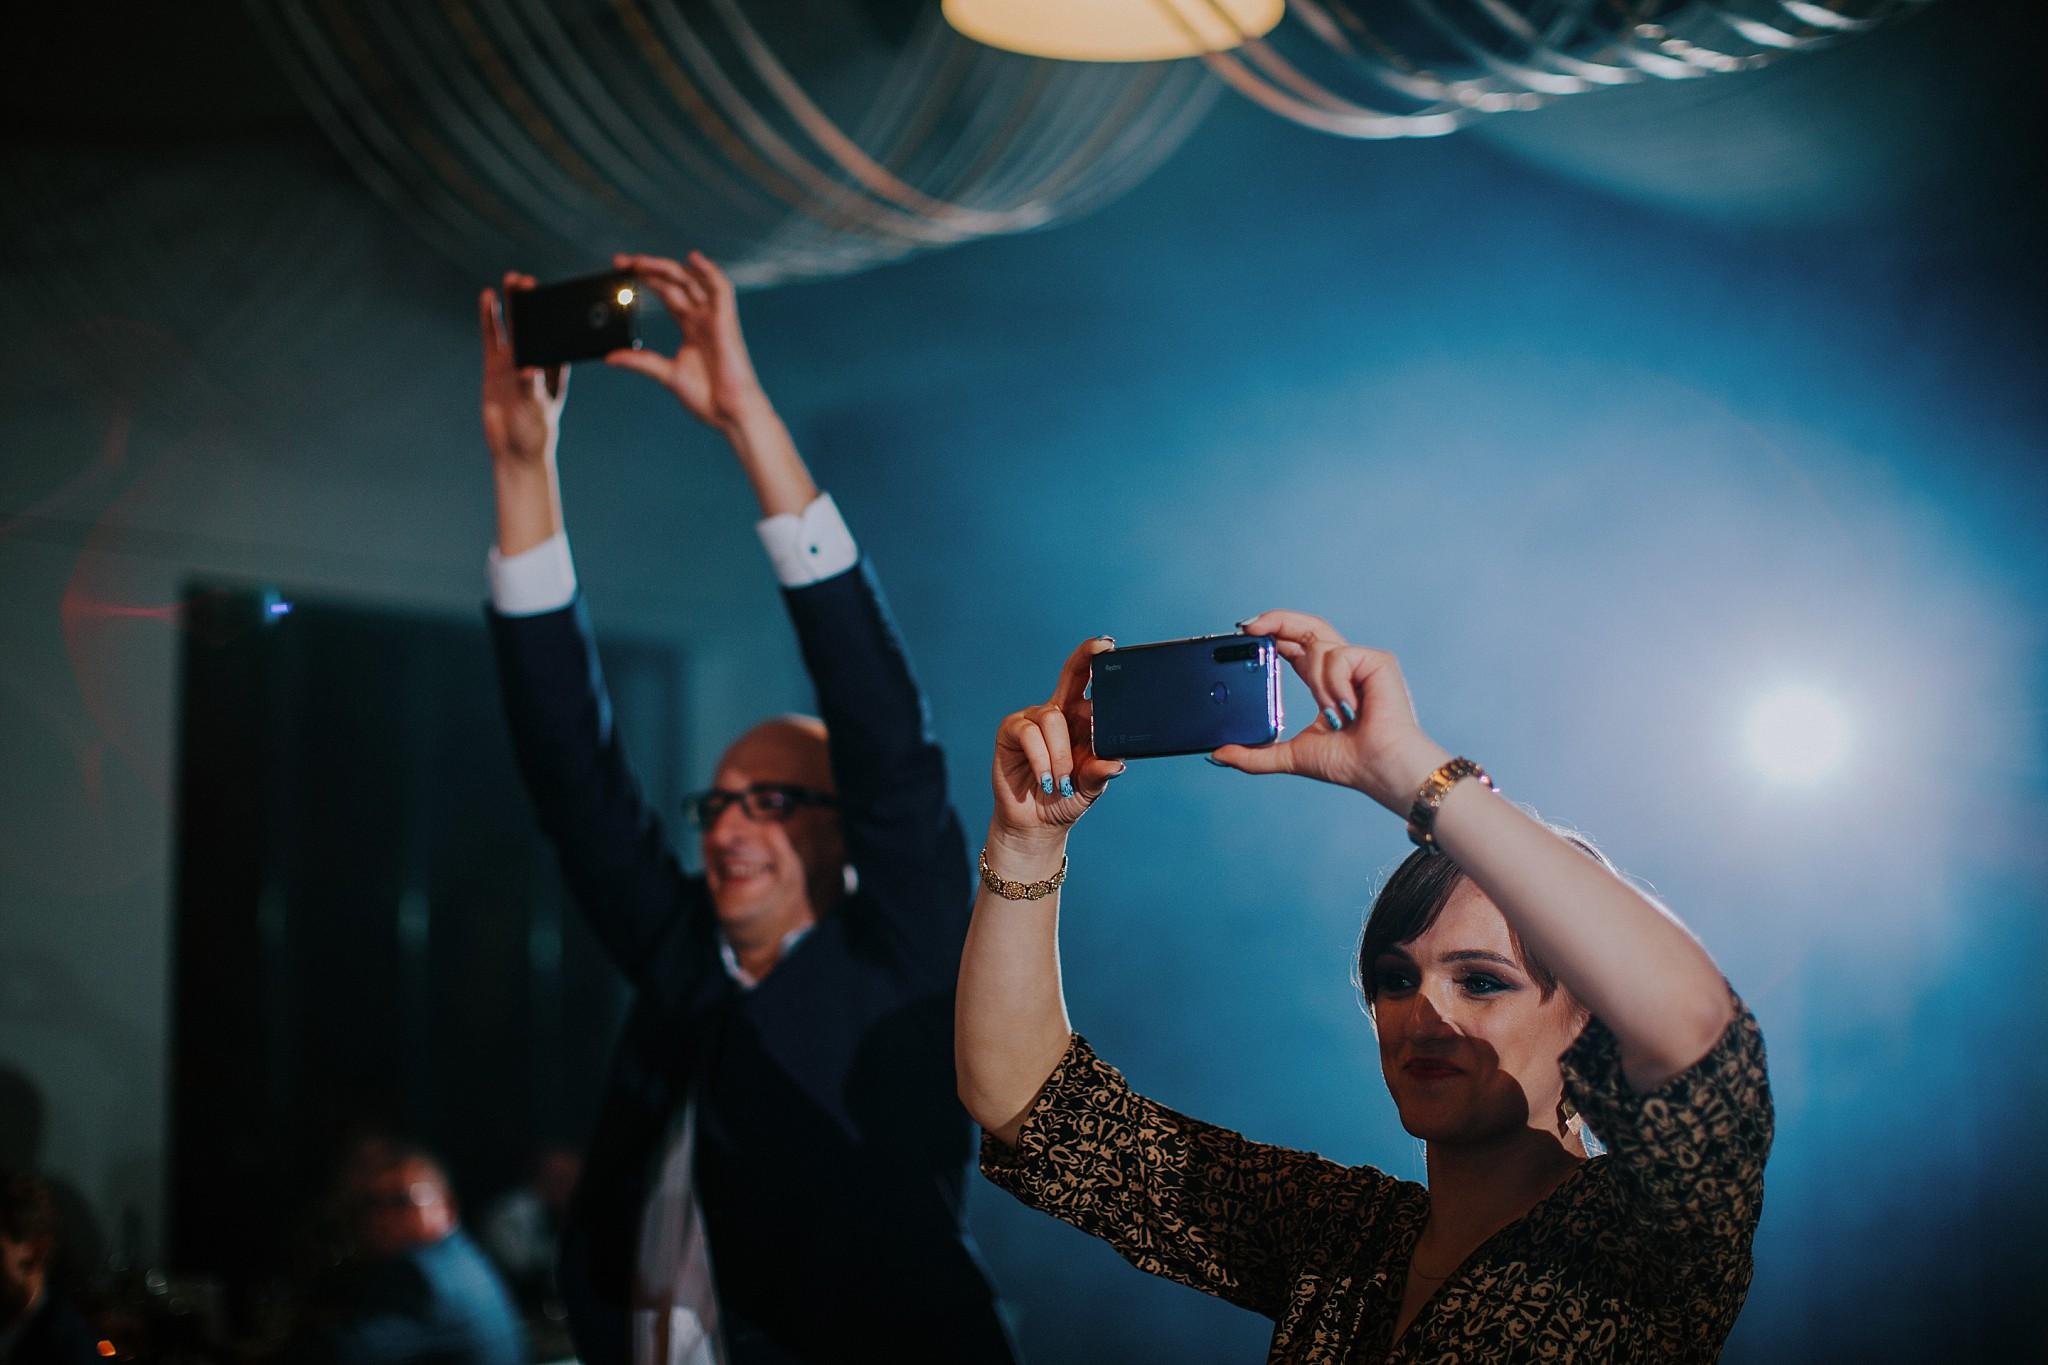 fotograf poznan wesele dobra truskawka piekne wesele pod poznaniem wesele w dobrej truskawce piekna para mloda slub marzen slub koronawirus slub listopad wesele koronawirus 459